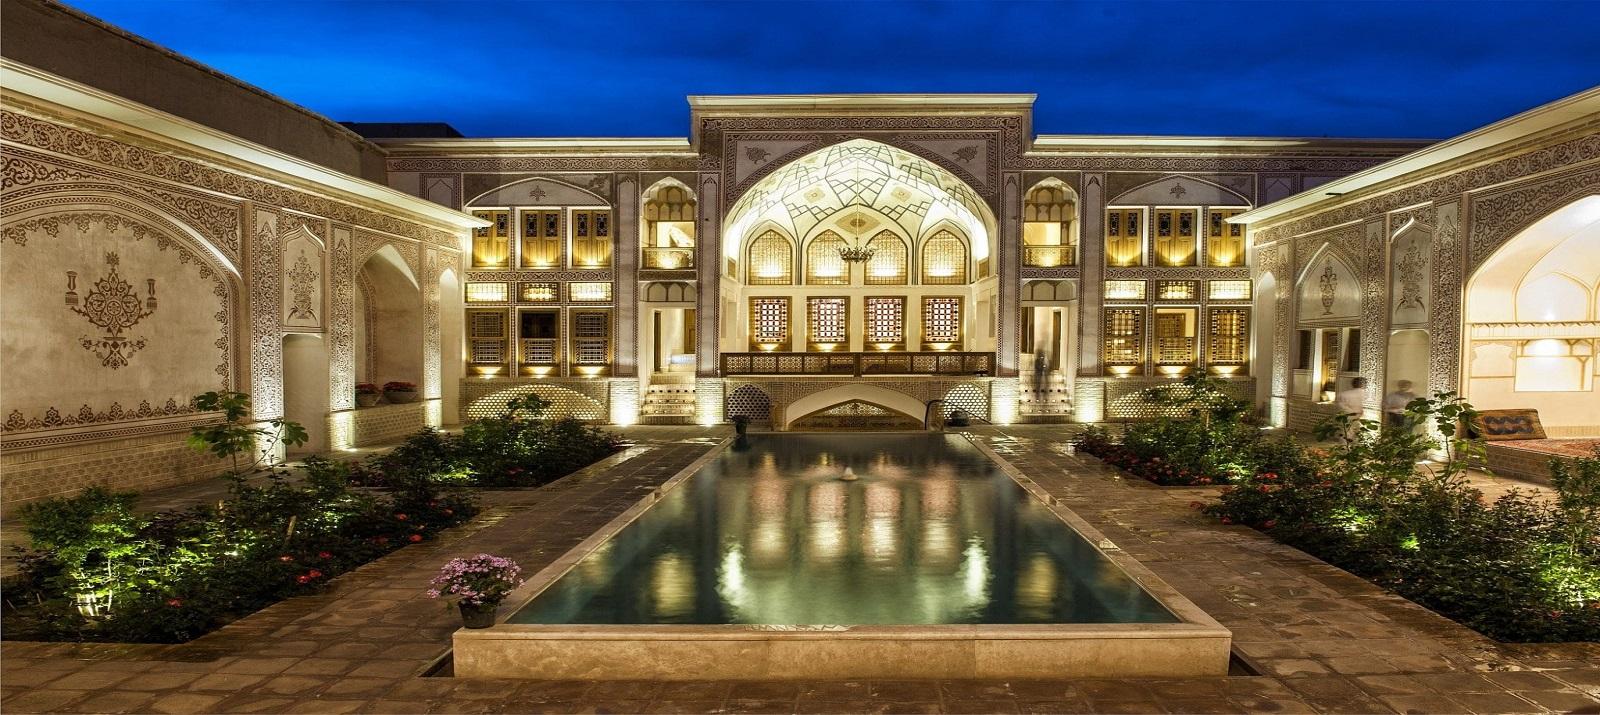 Hôtel Iran